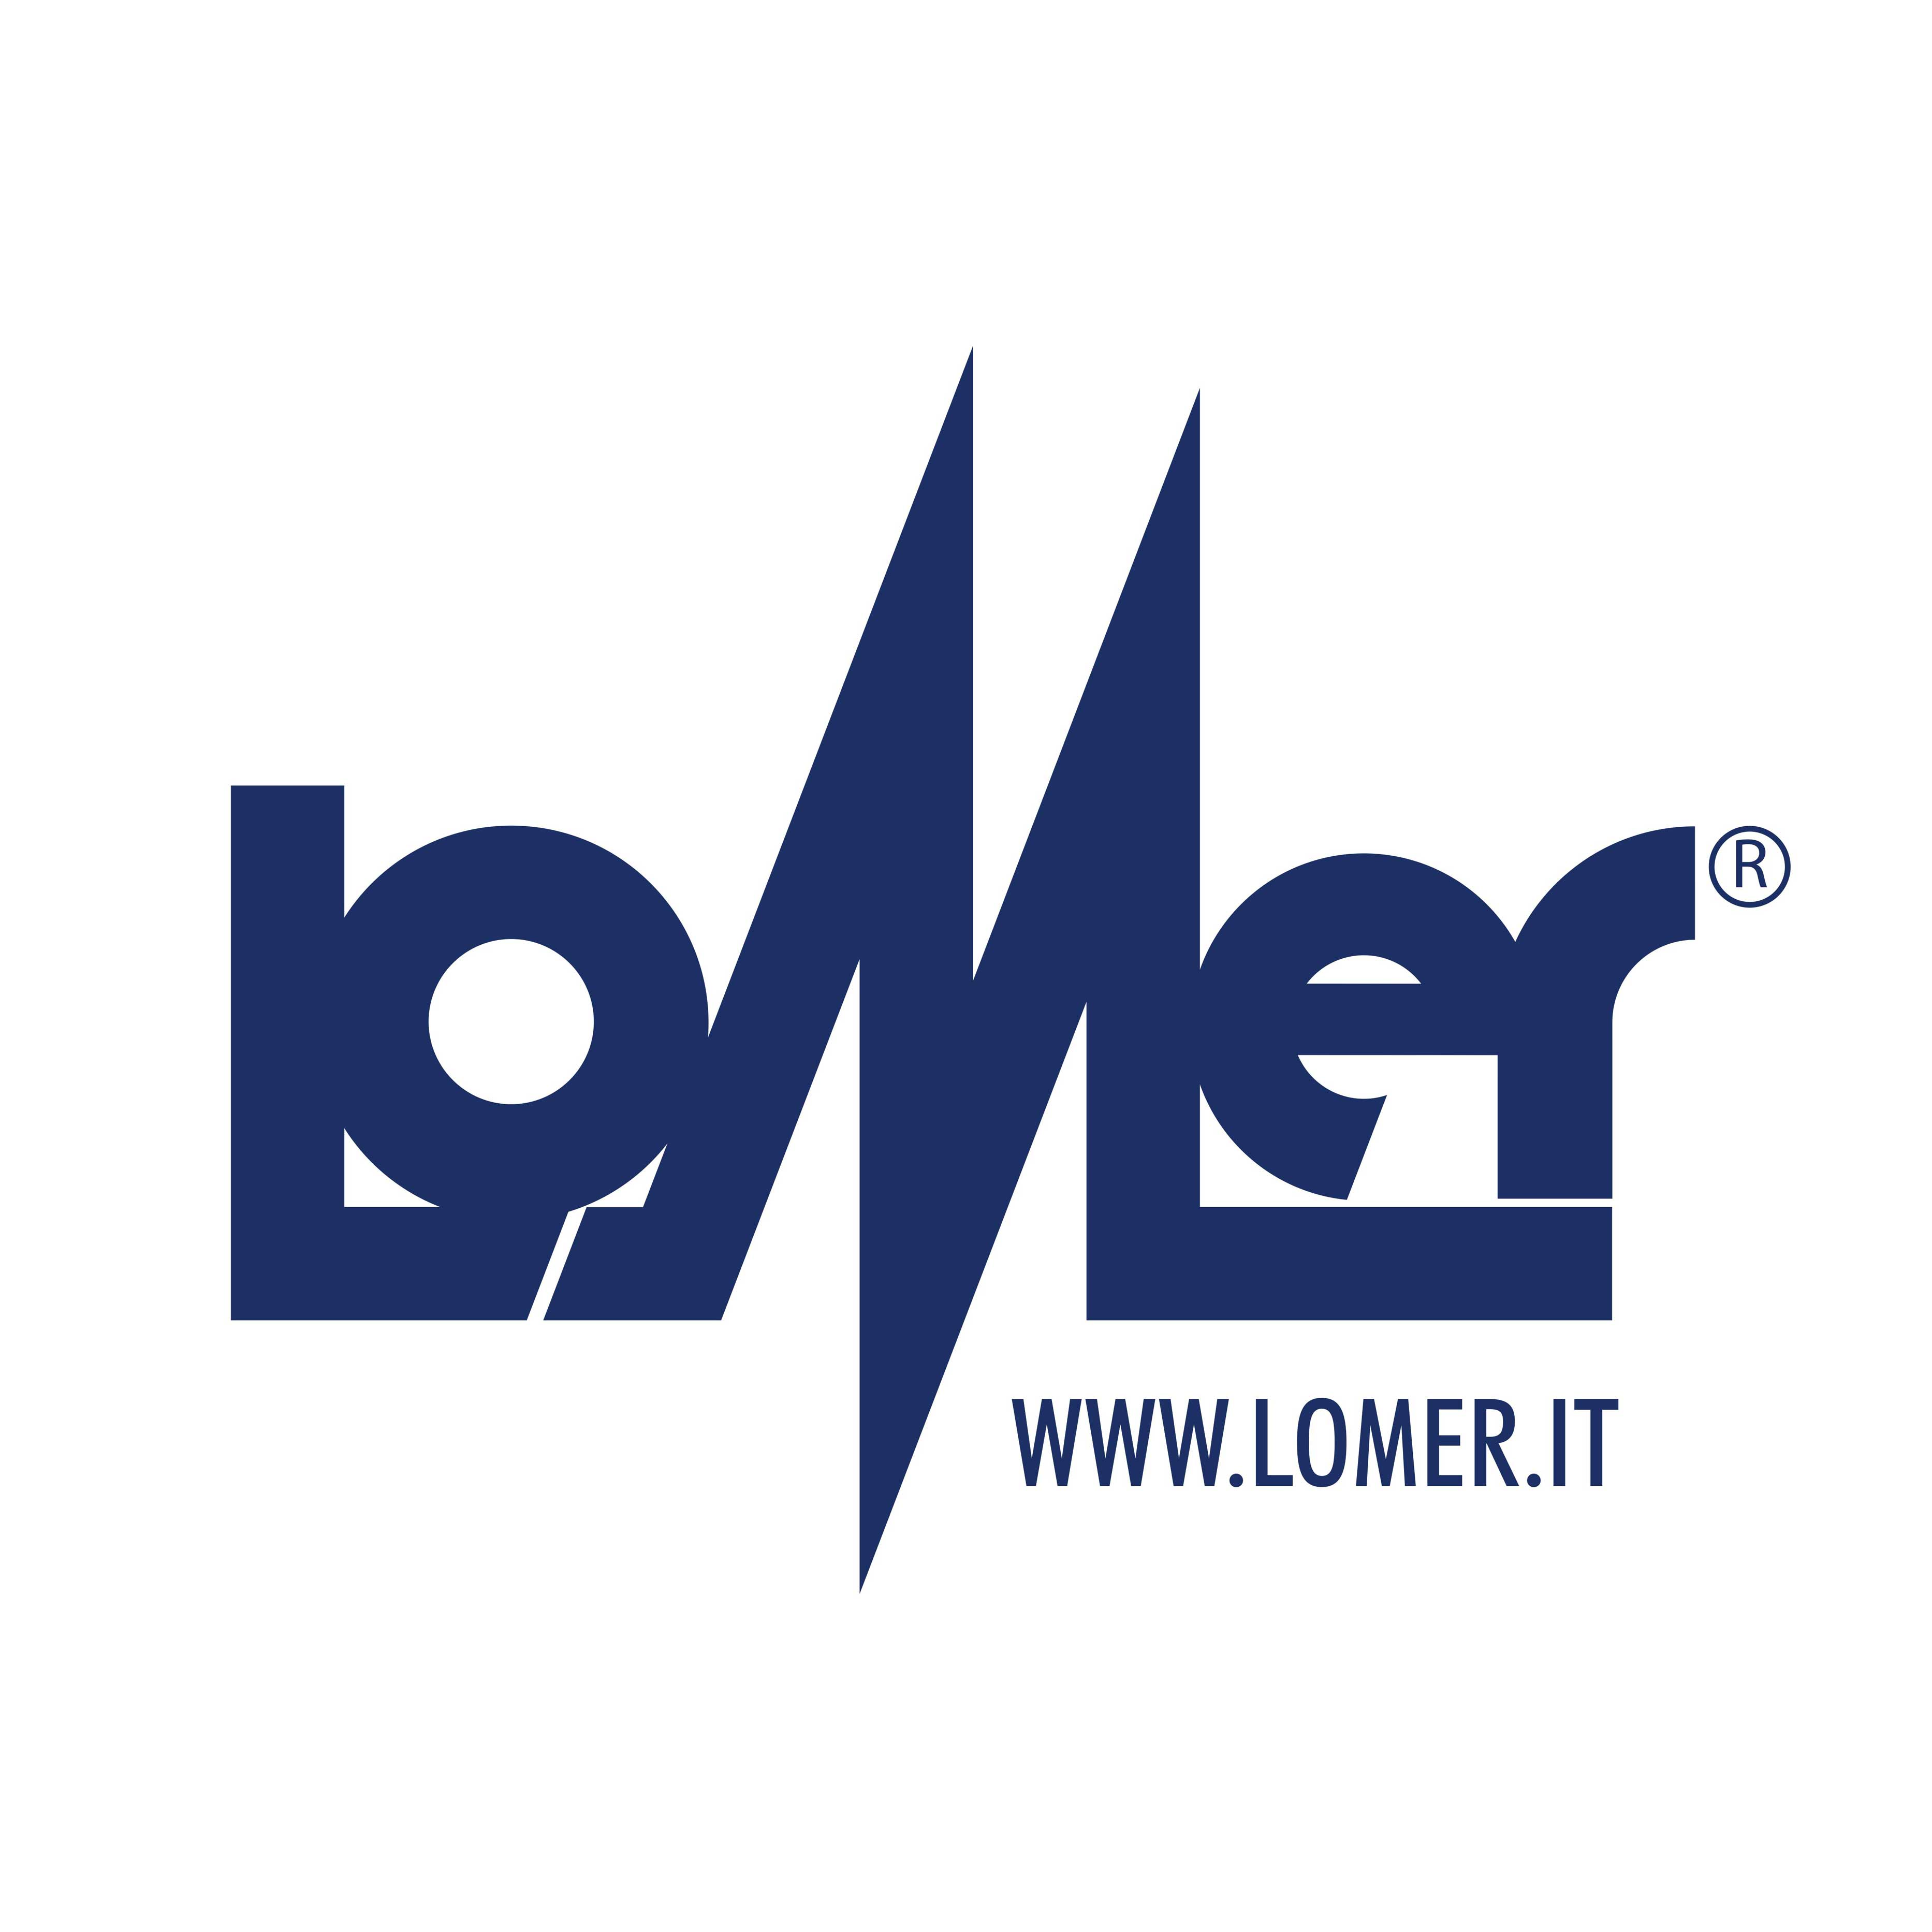 LOMER (ロメール)